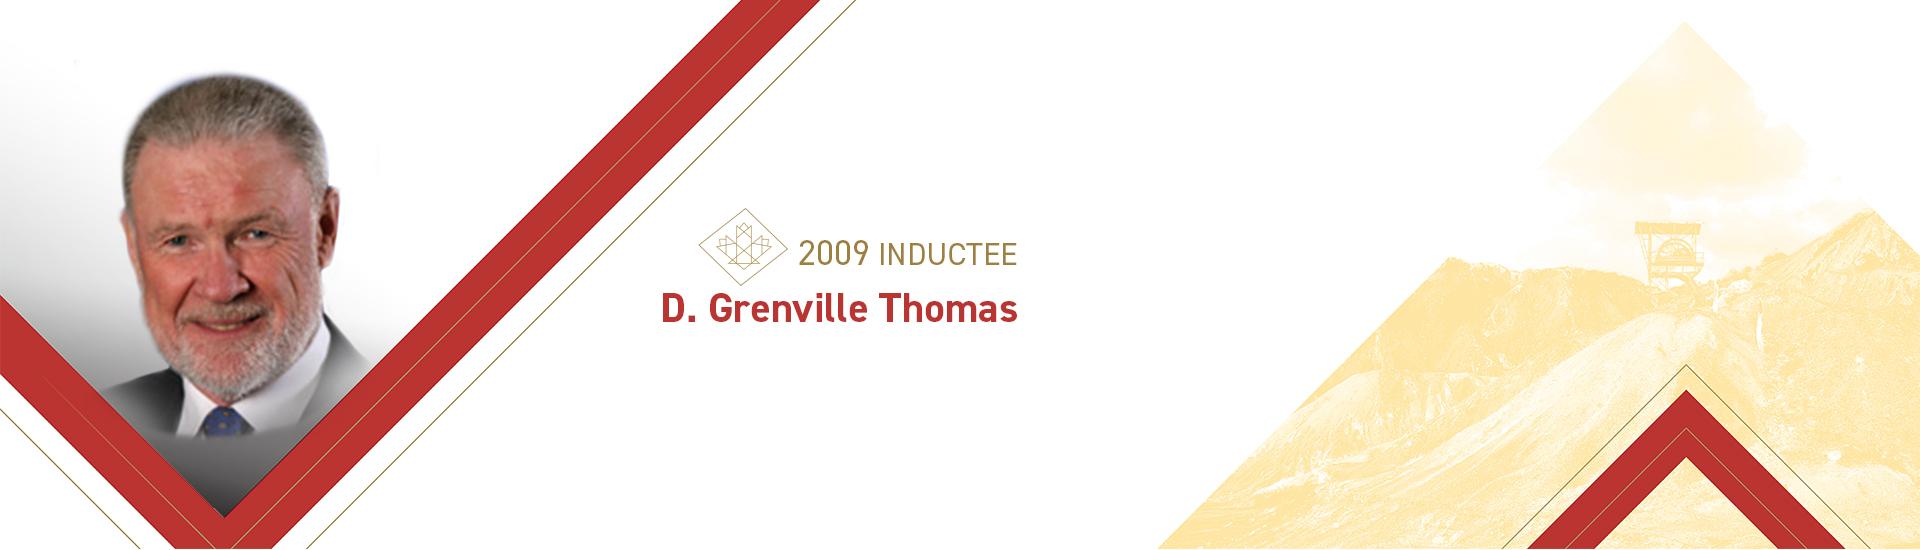 D. Grenville Thomas (b. 1941)